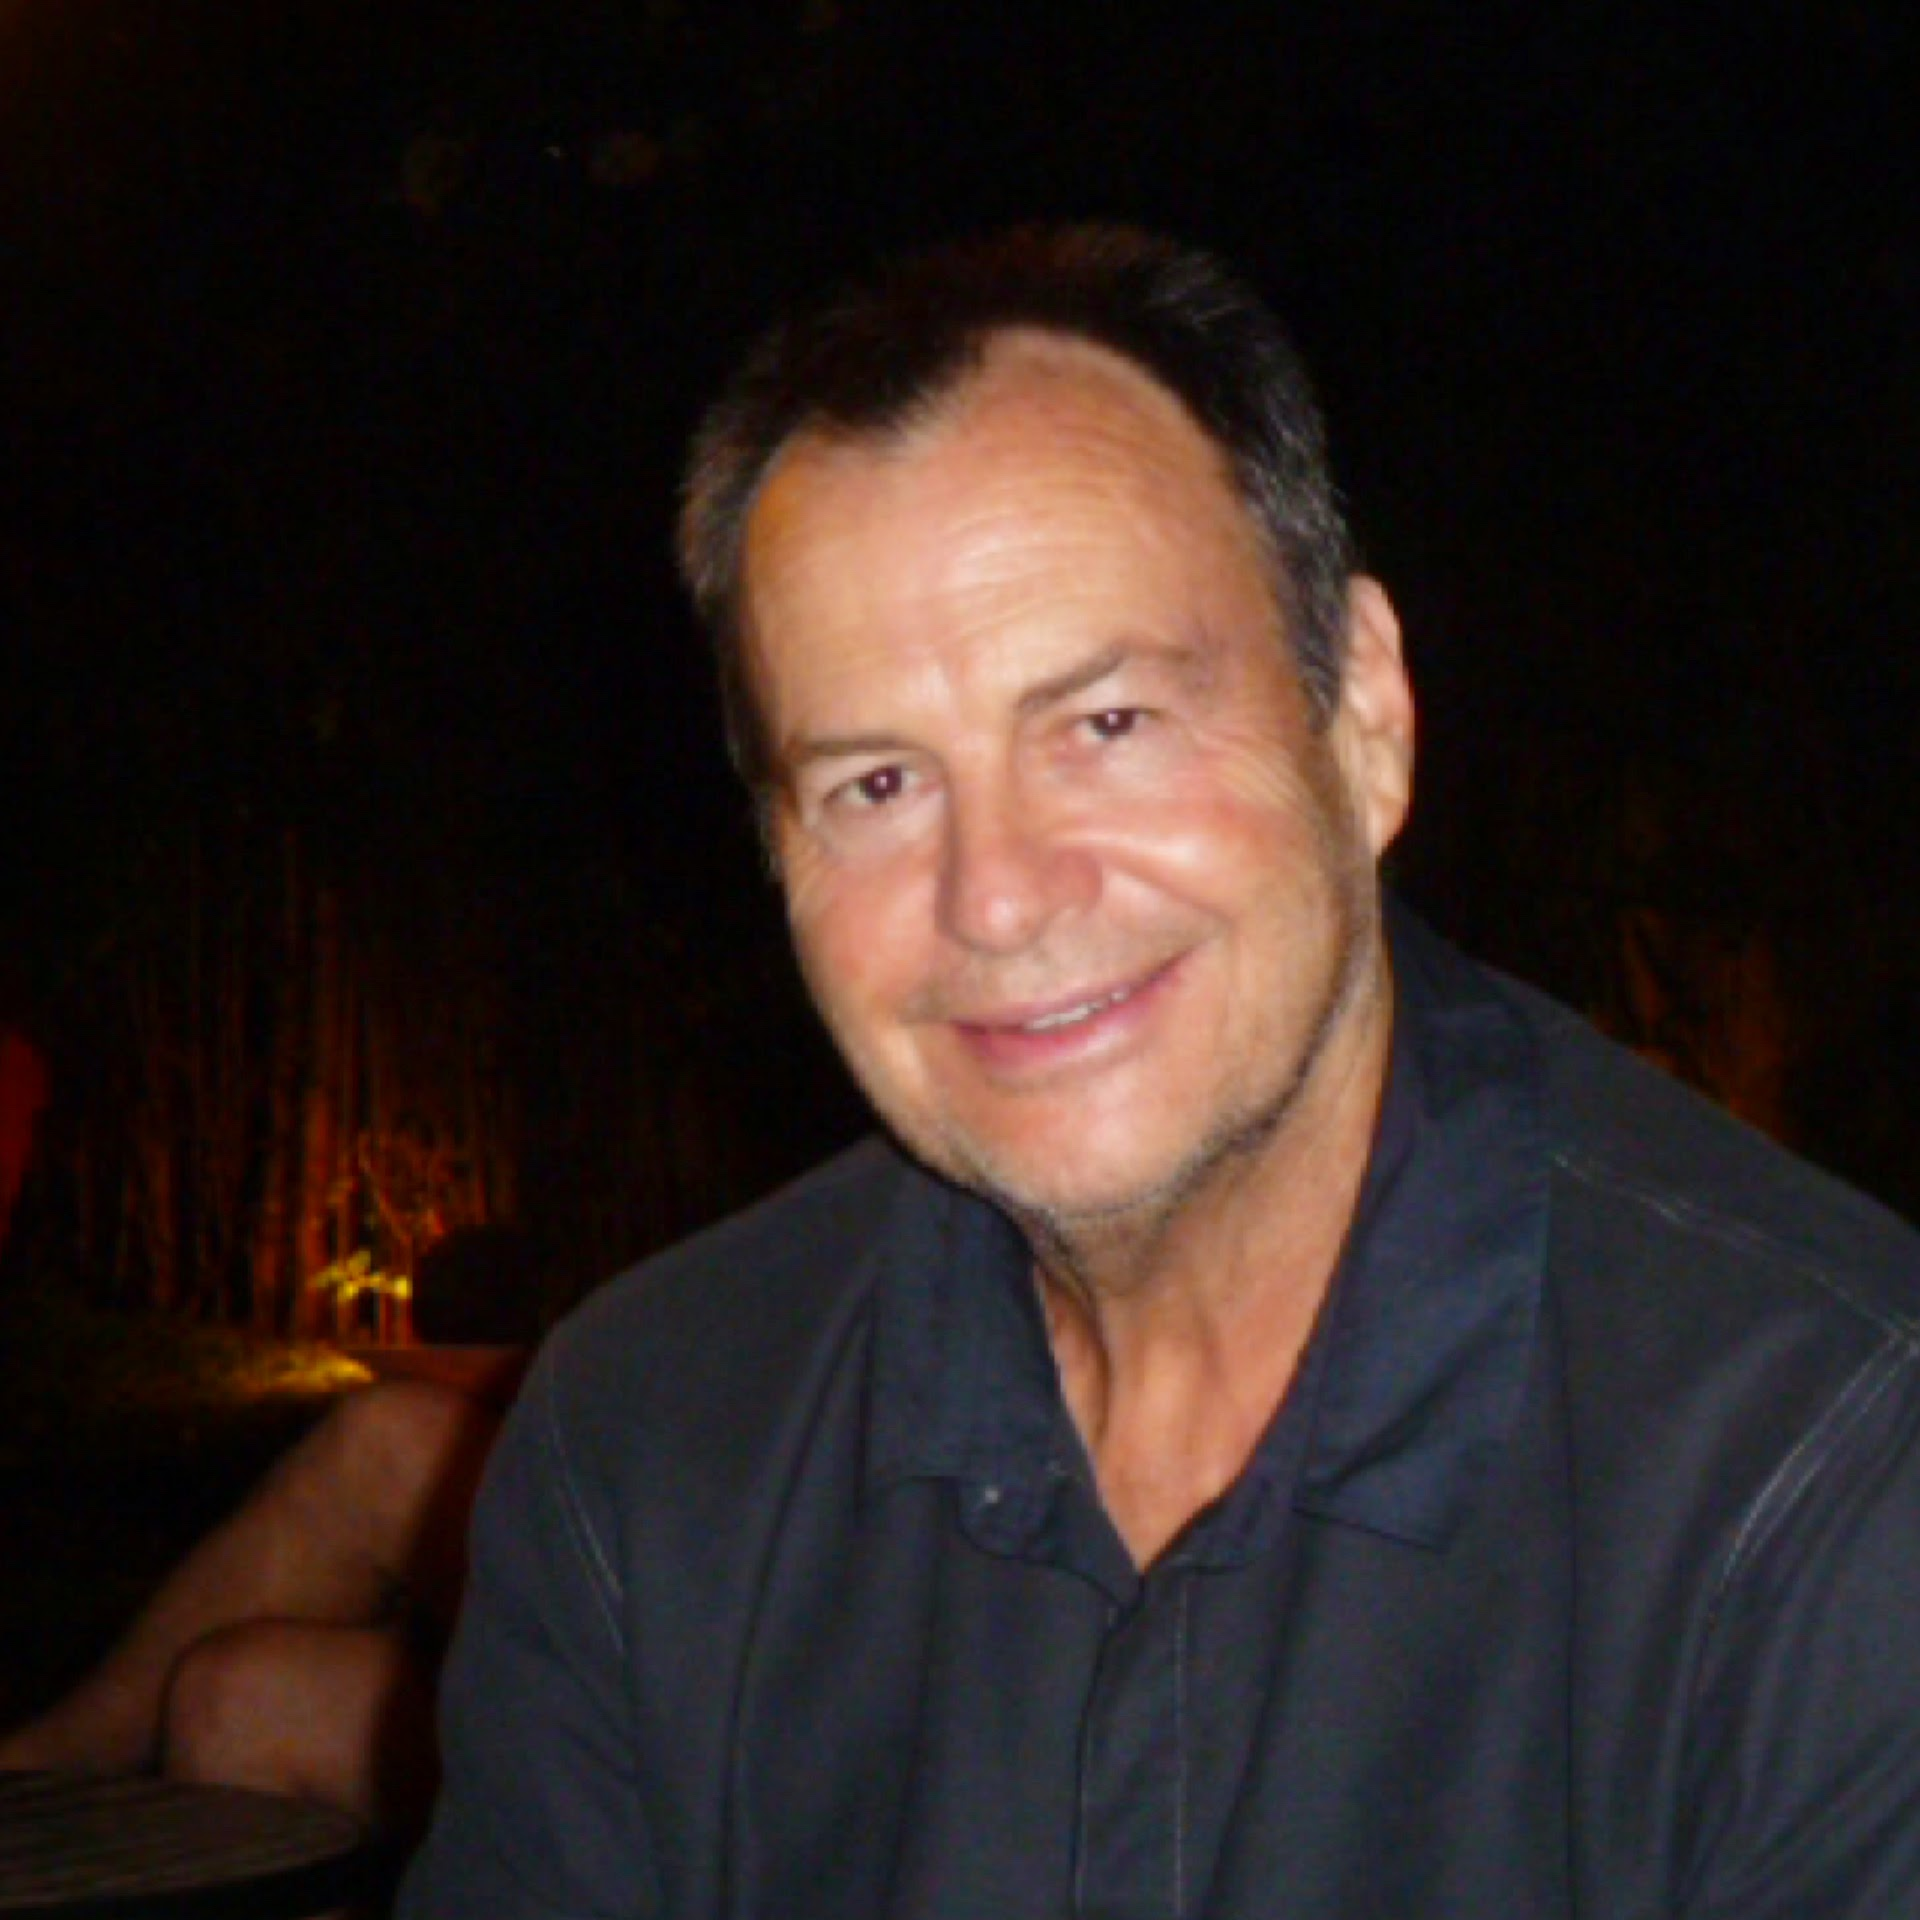 Mike Croy